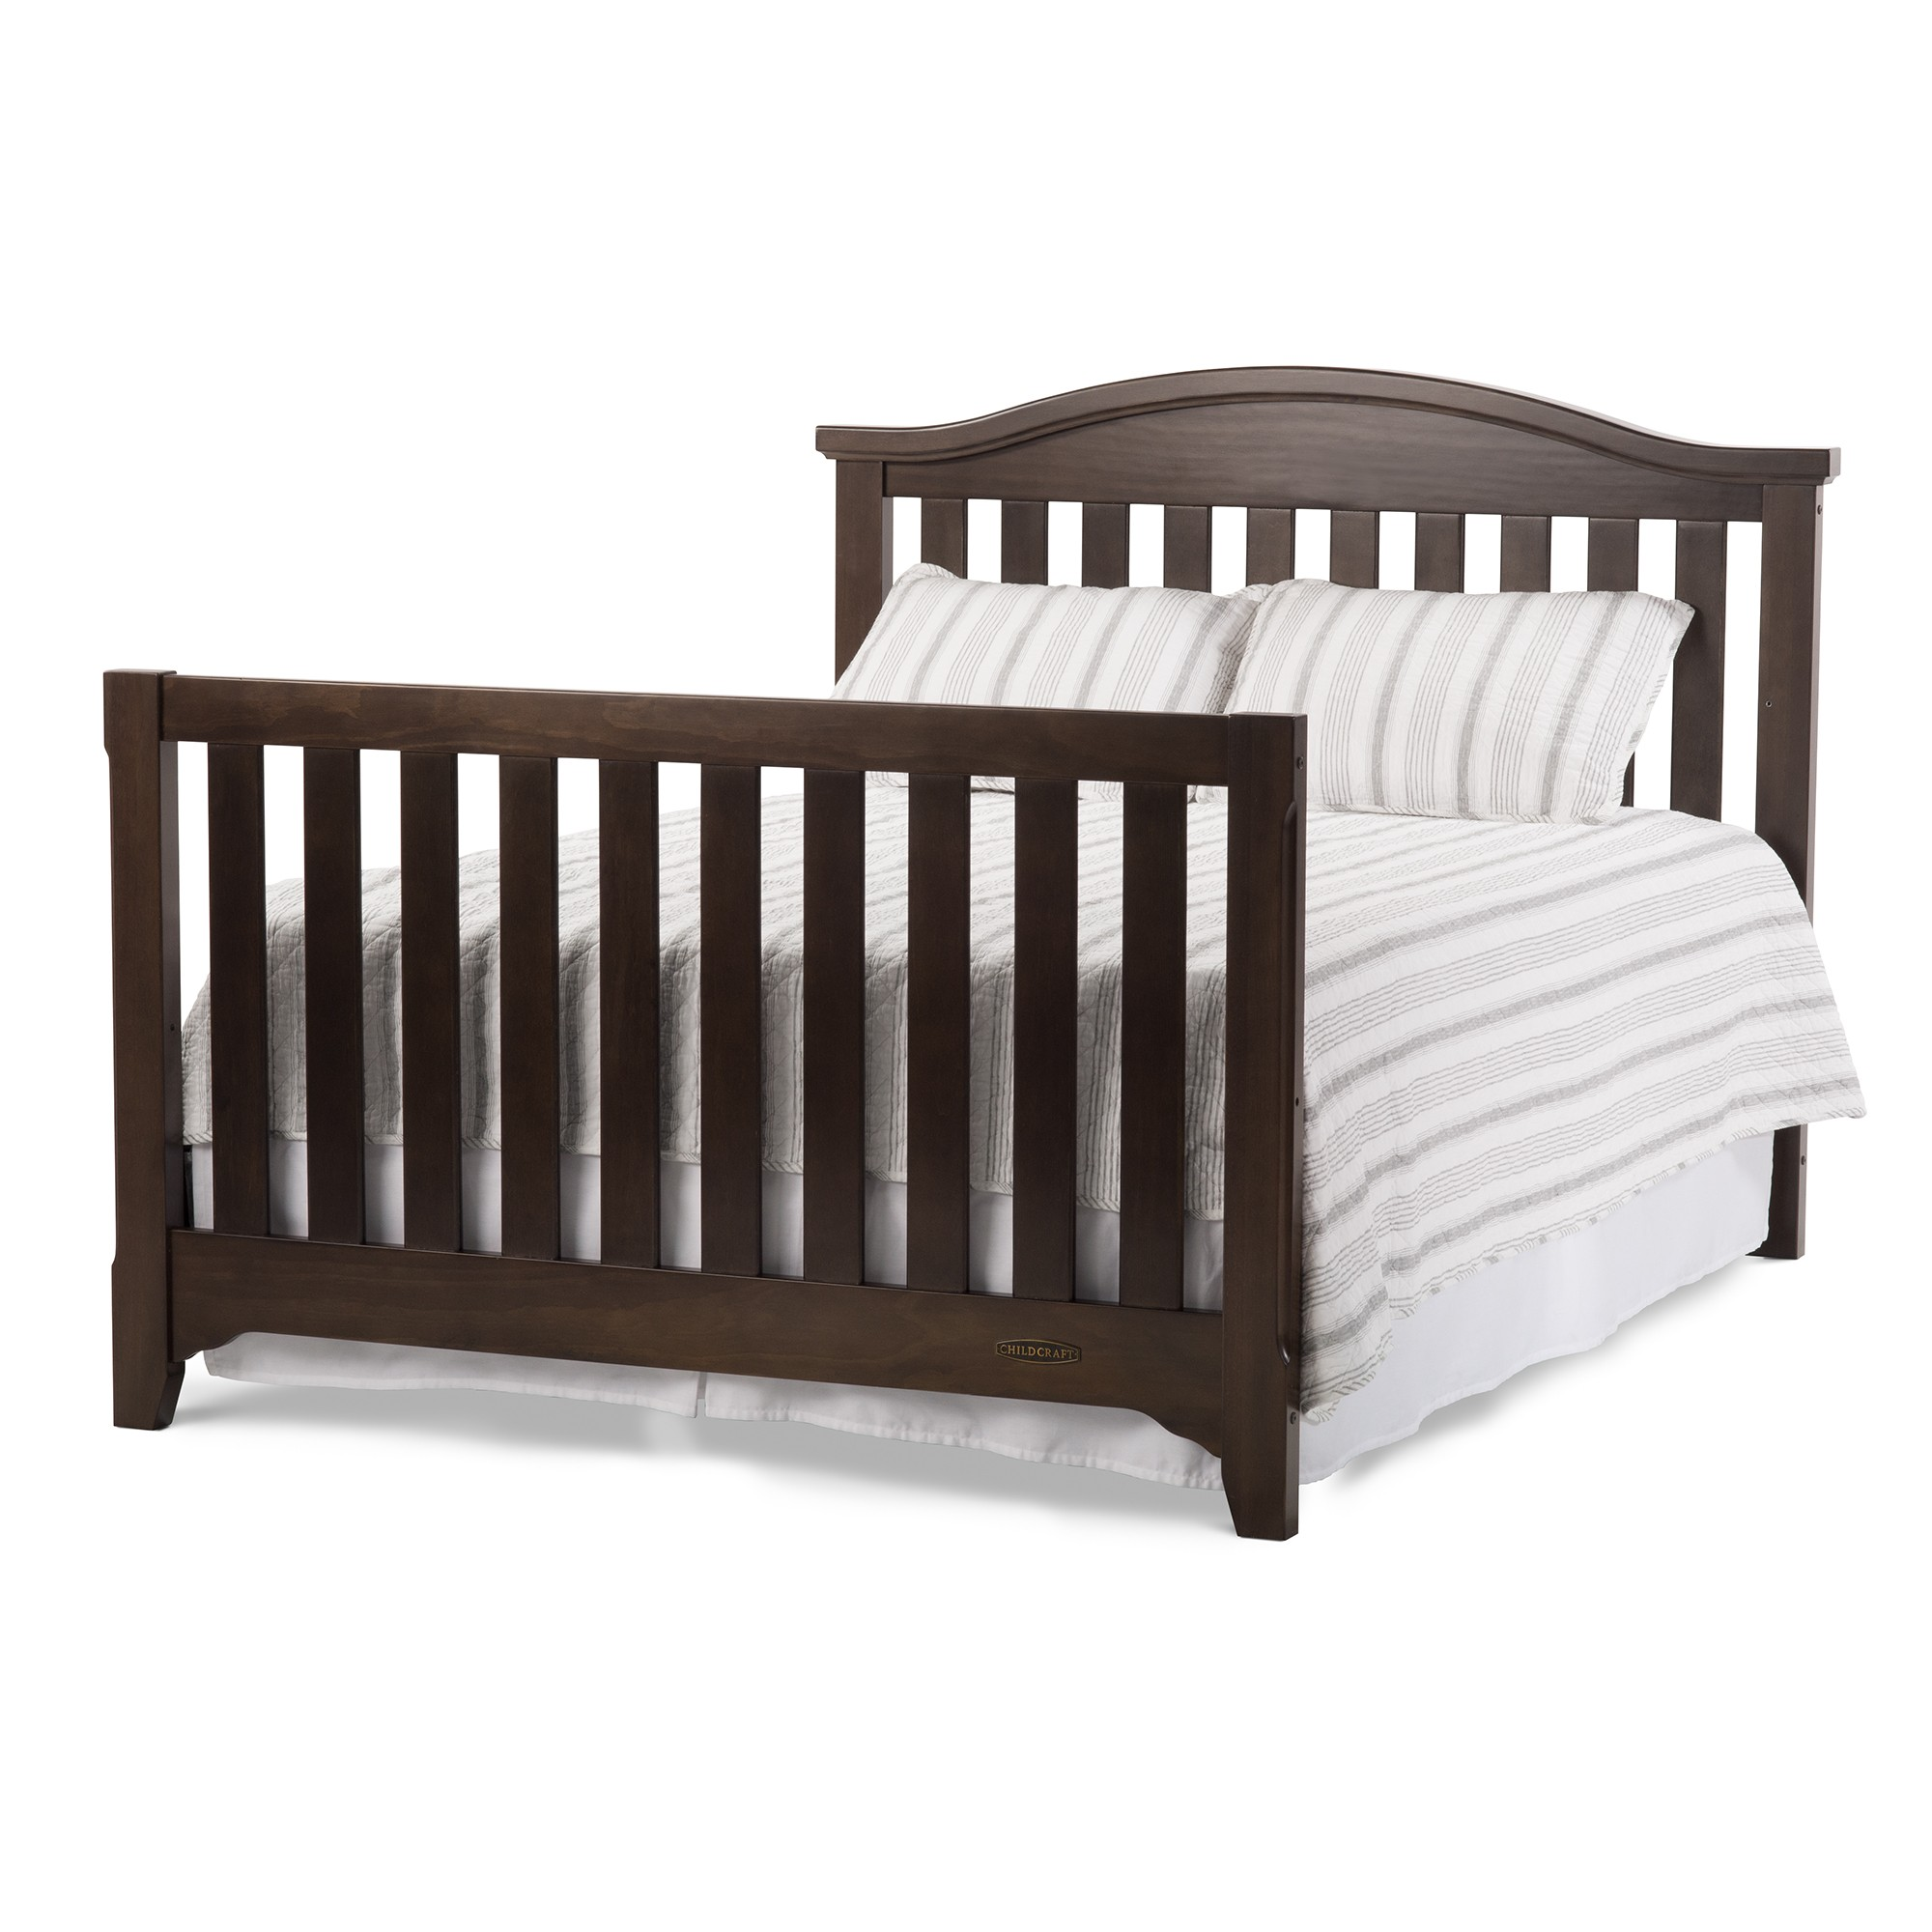 Whitman 4 In 1 Convertible Crib Child Craft